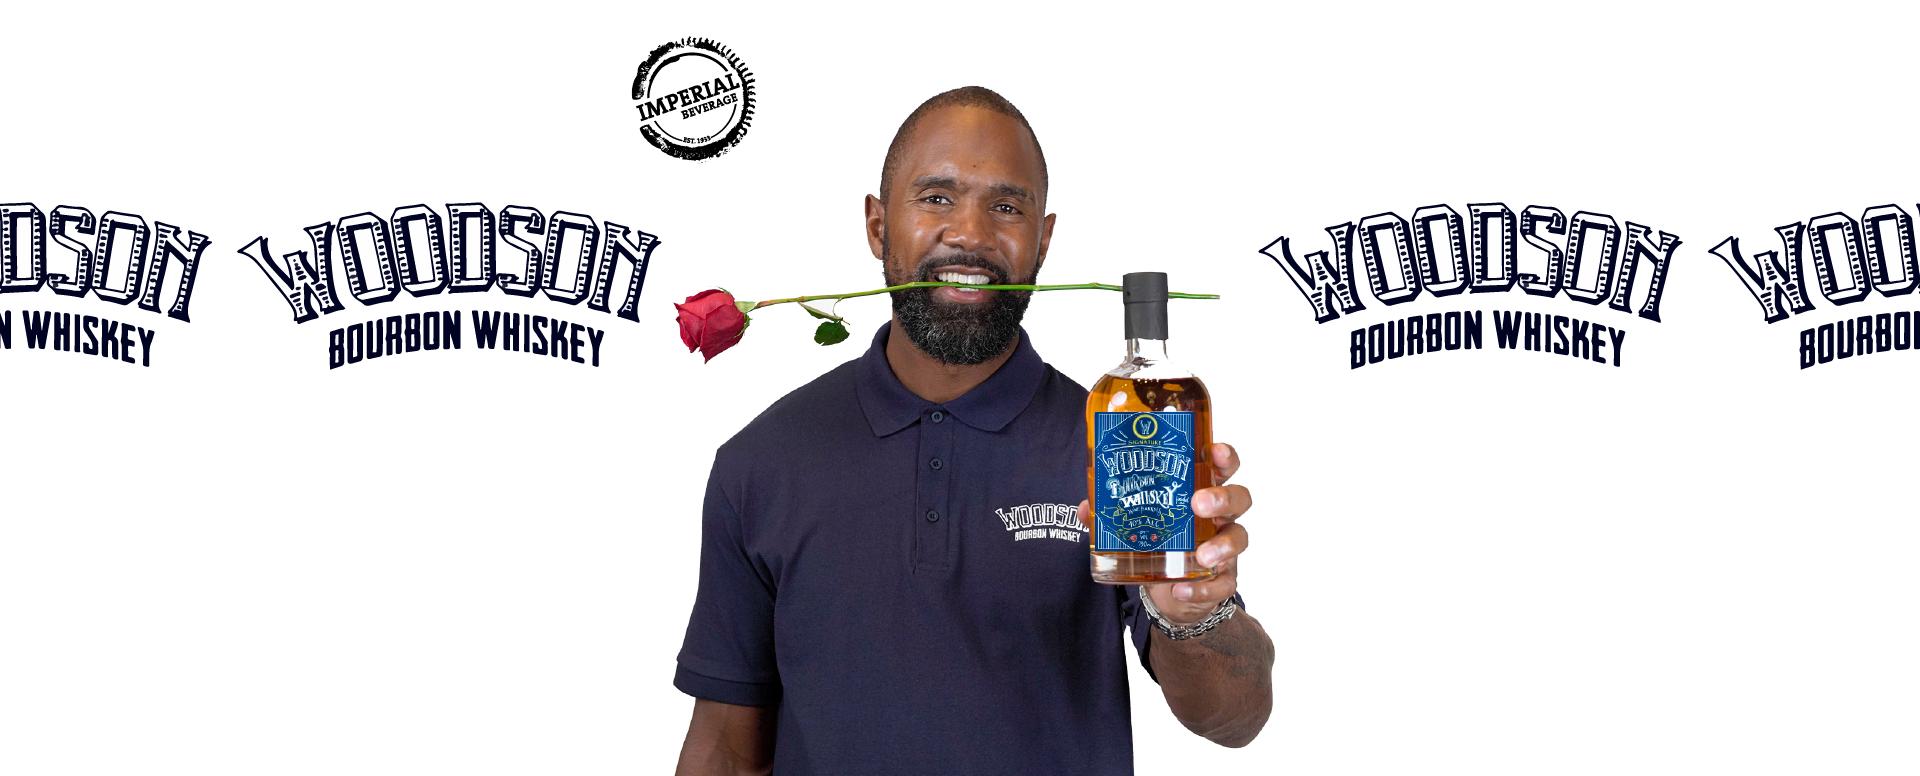 Imperial Beverage Woodson Bourbon